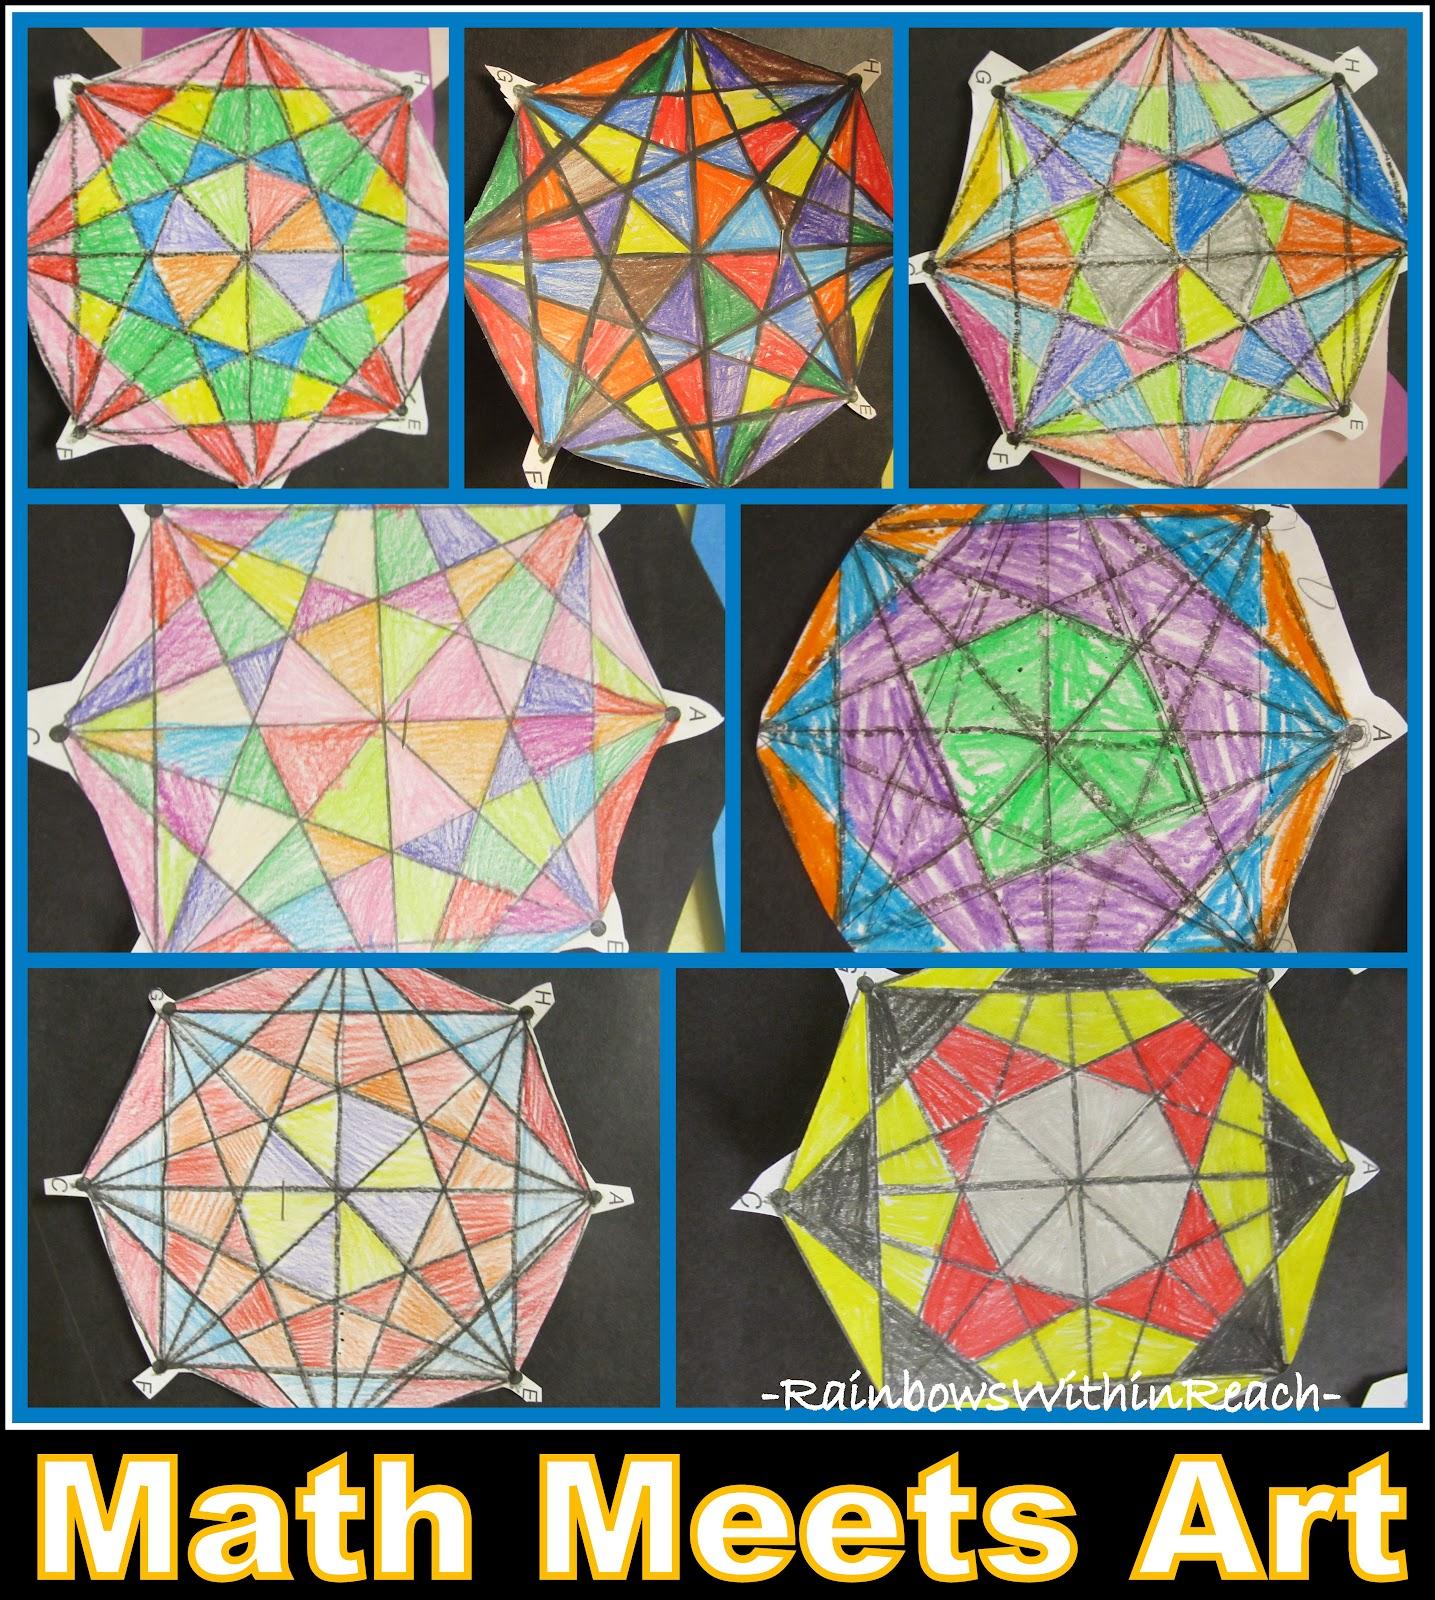 10 geometric art explorations for math learning - 736×820